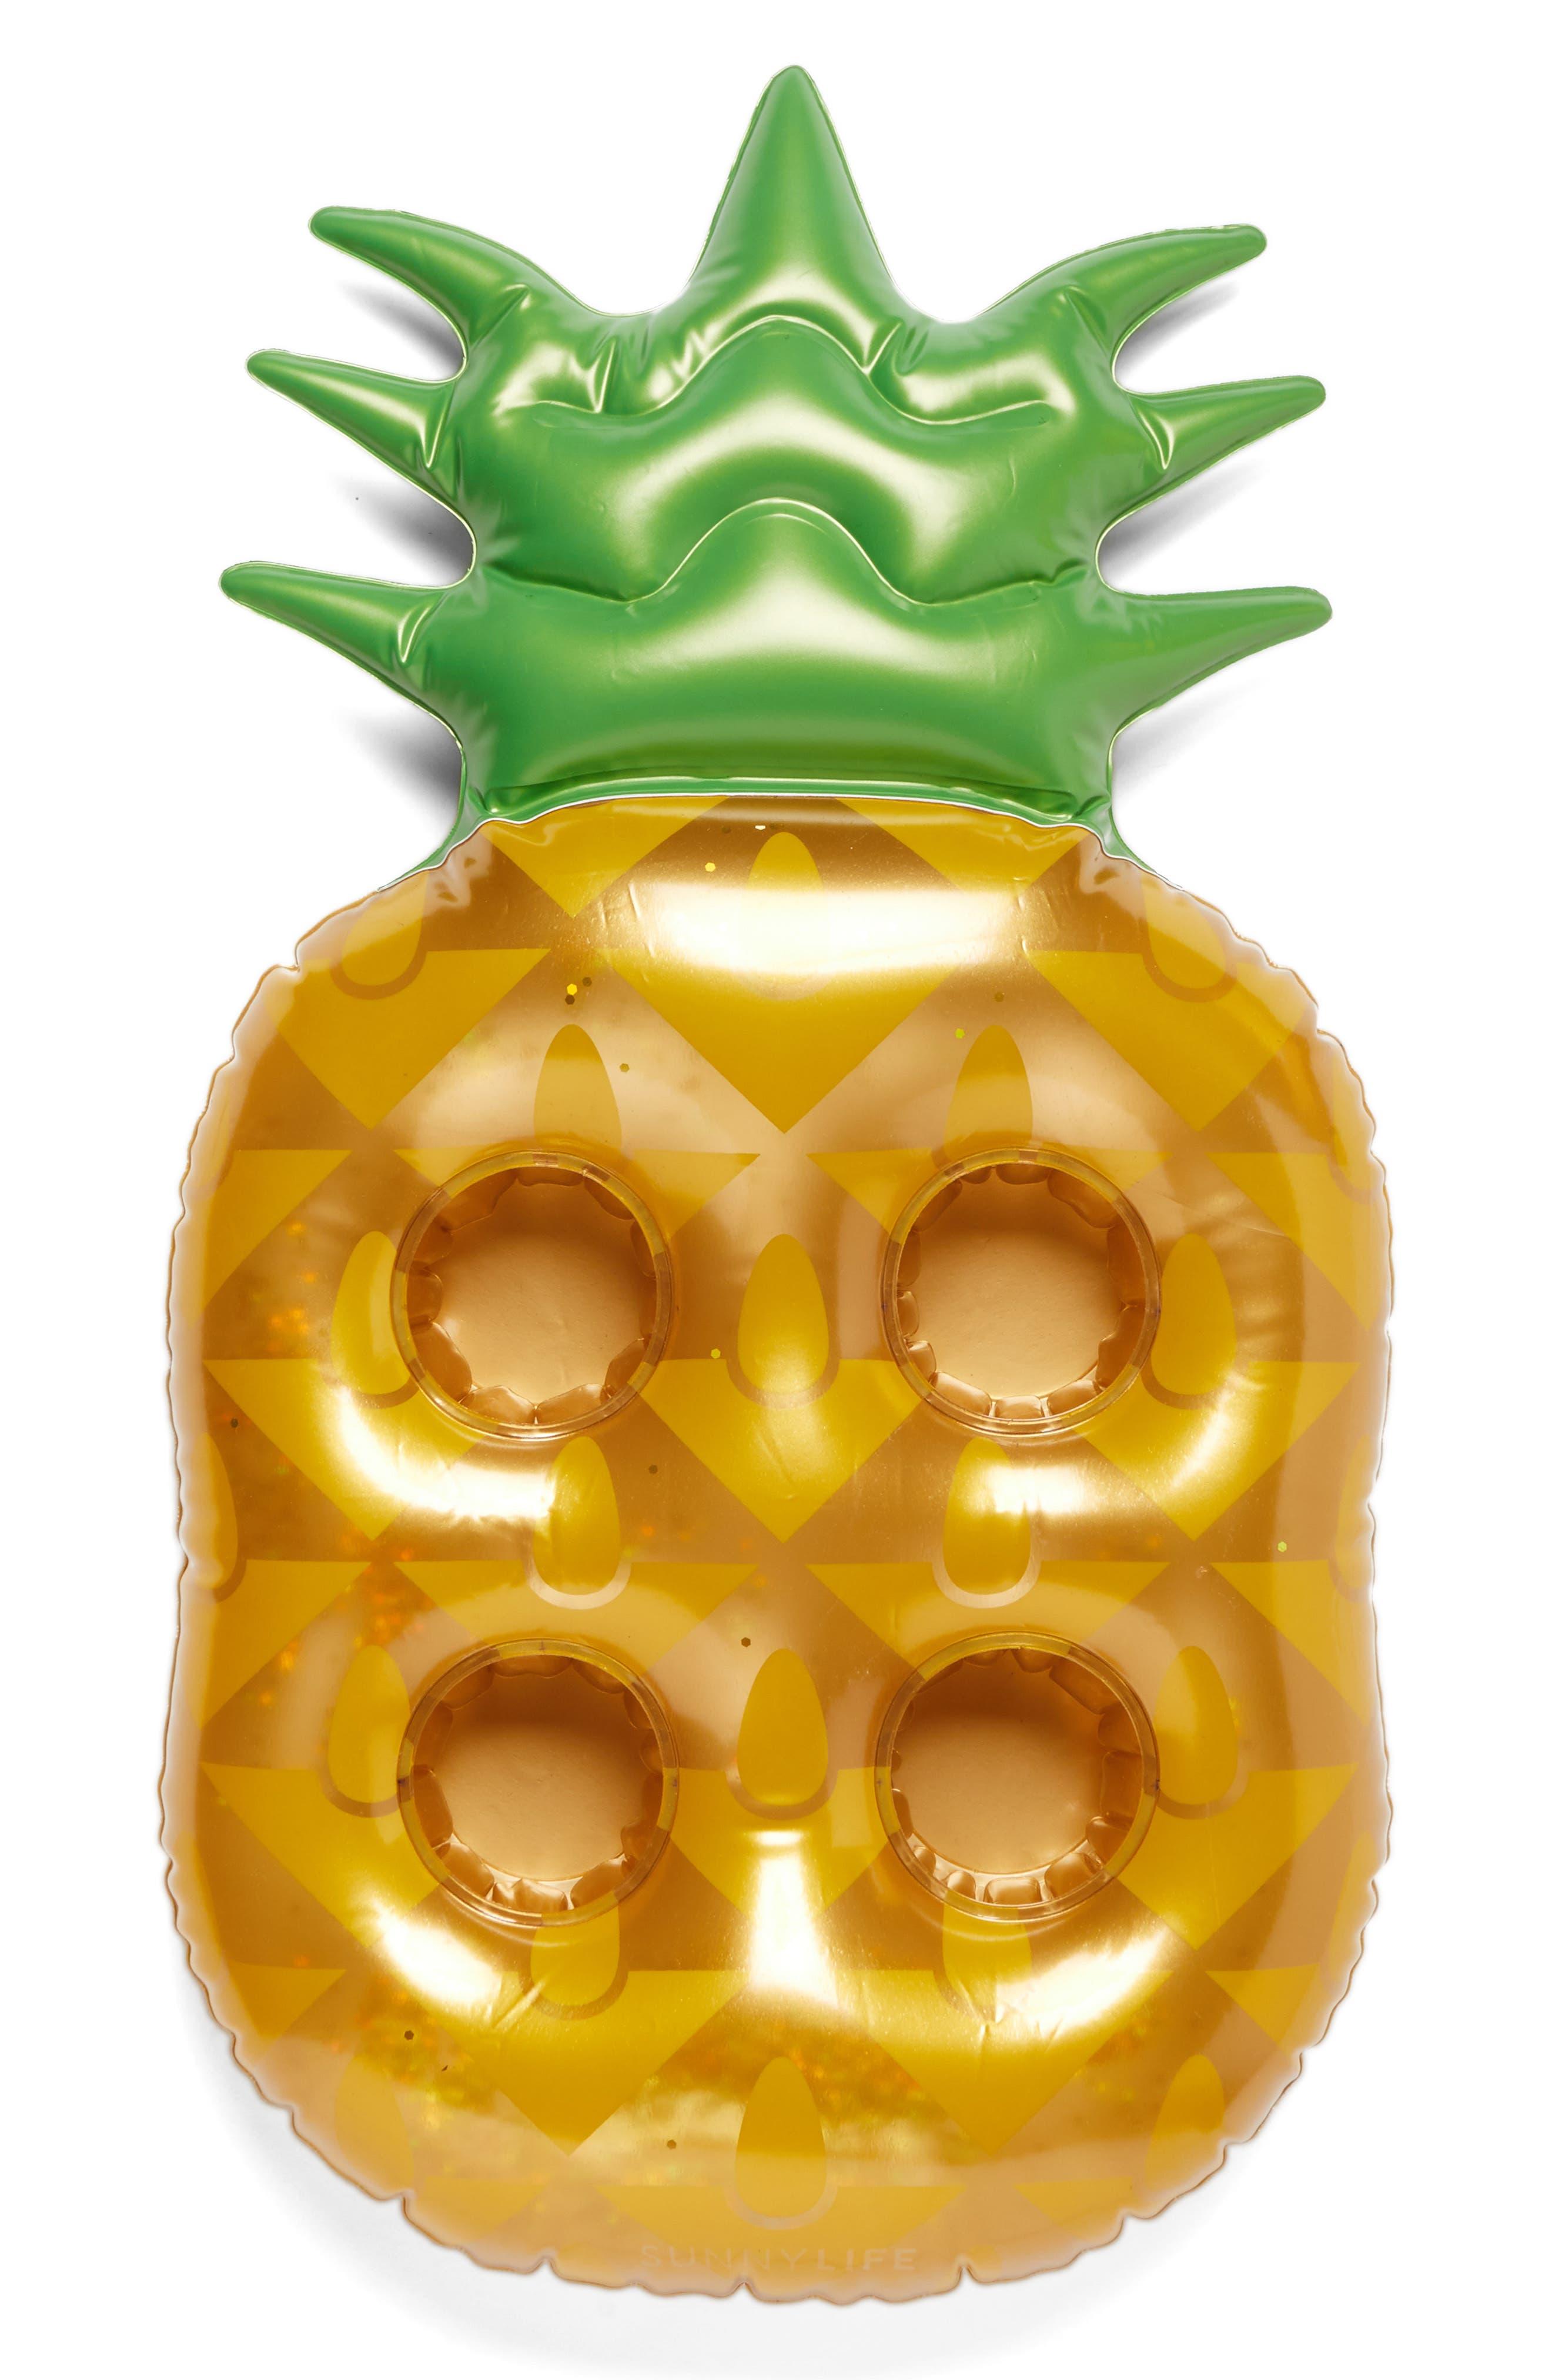 Alternate Image 1 Selected - Sunnylife Inflatable Pineapple Drink Holder Pool Float